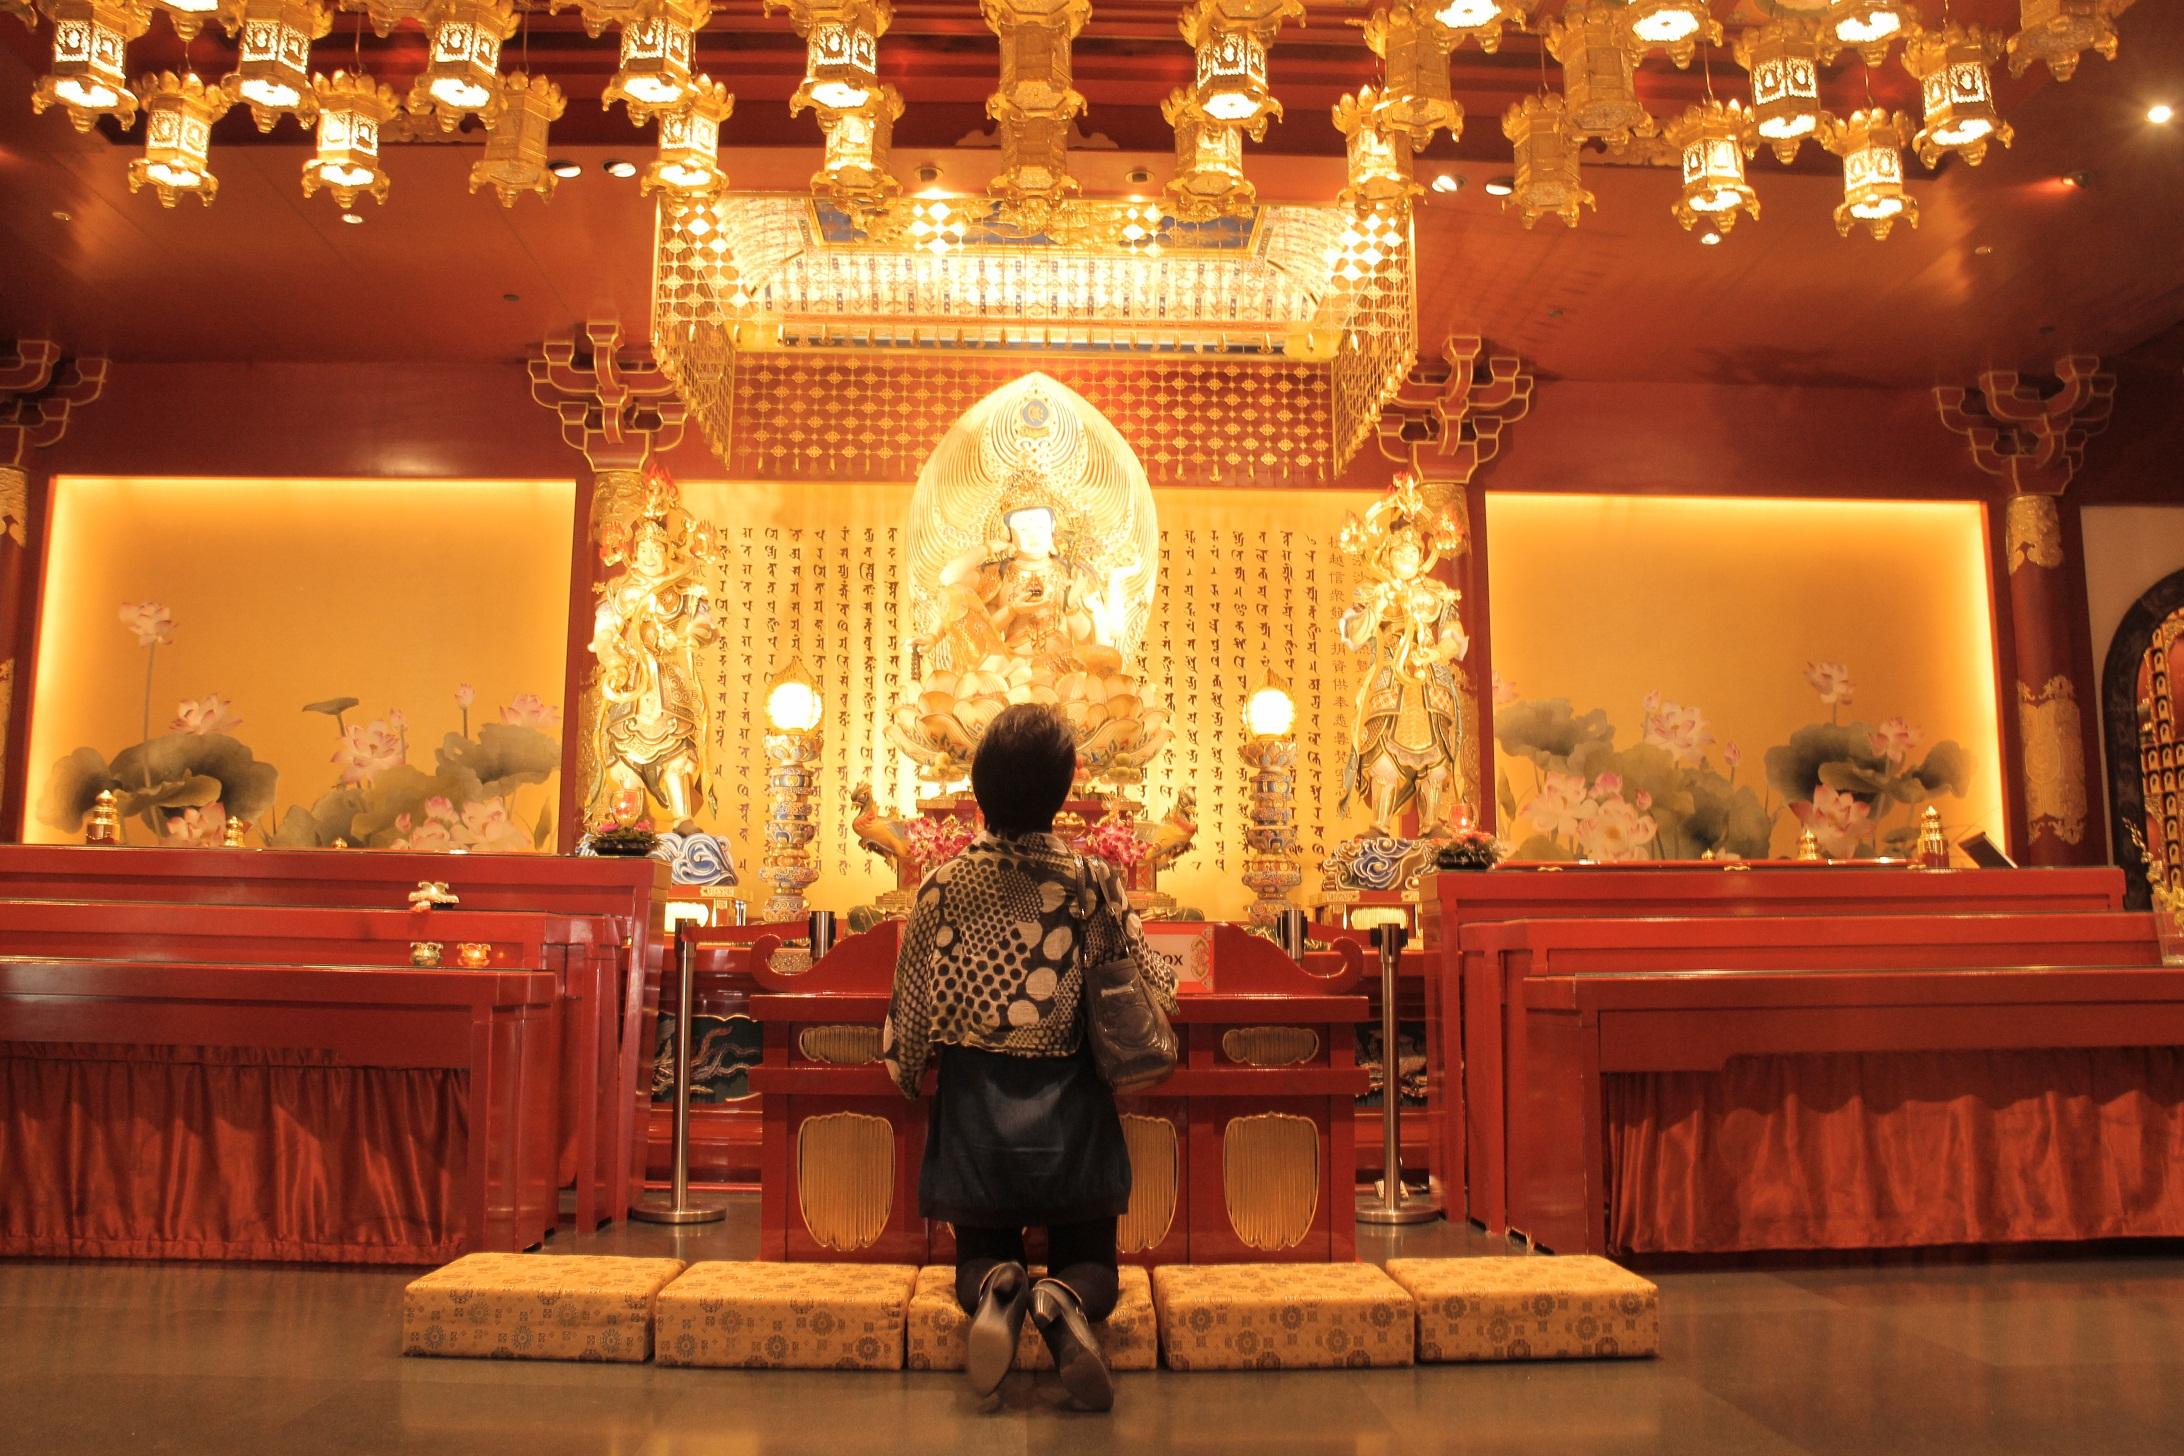 china town singapura, China Town Singapura, Jurnal Suzannita